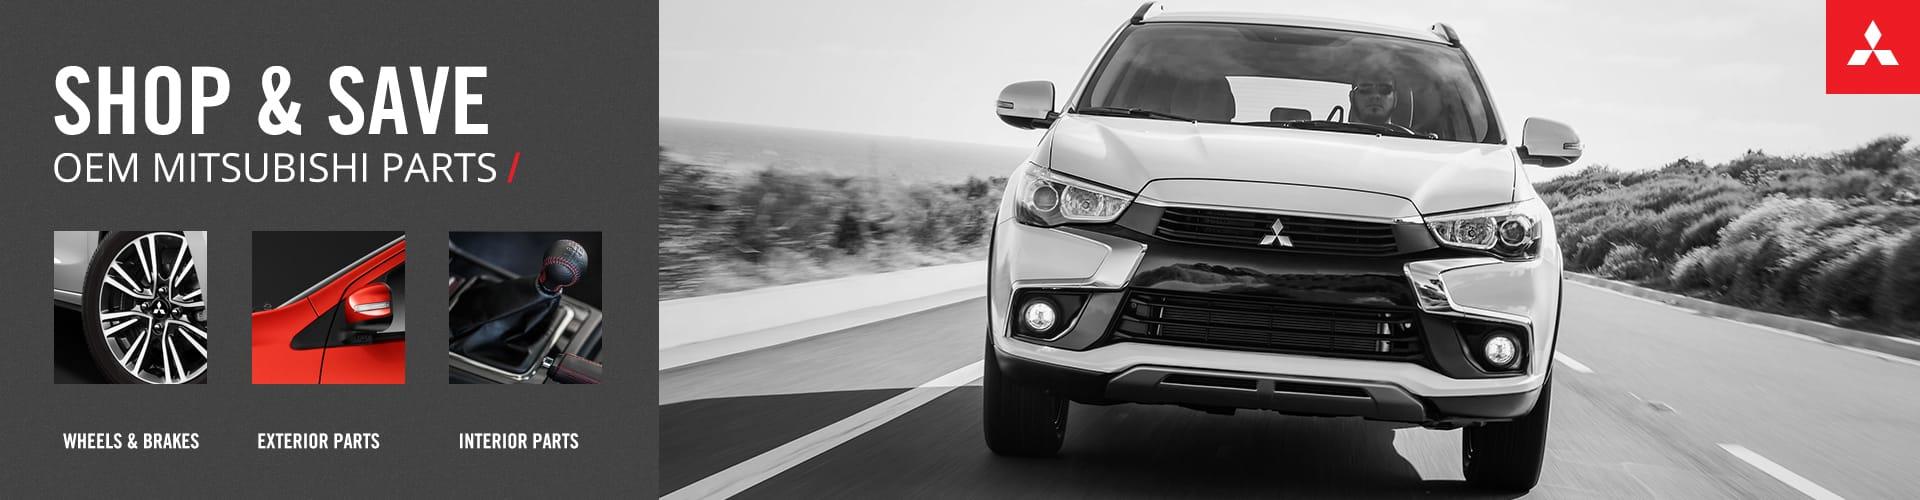 Genuine OEM Mitsubishi Parts and Accessories | MitsuOnSale